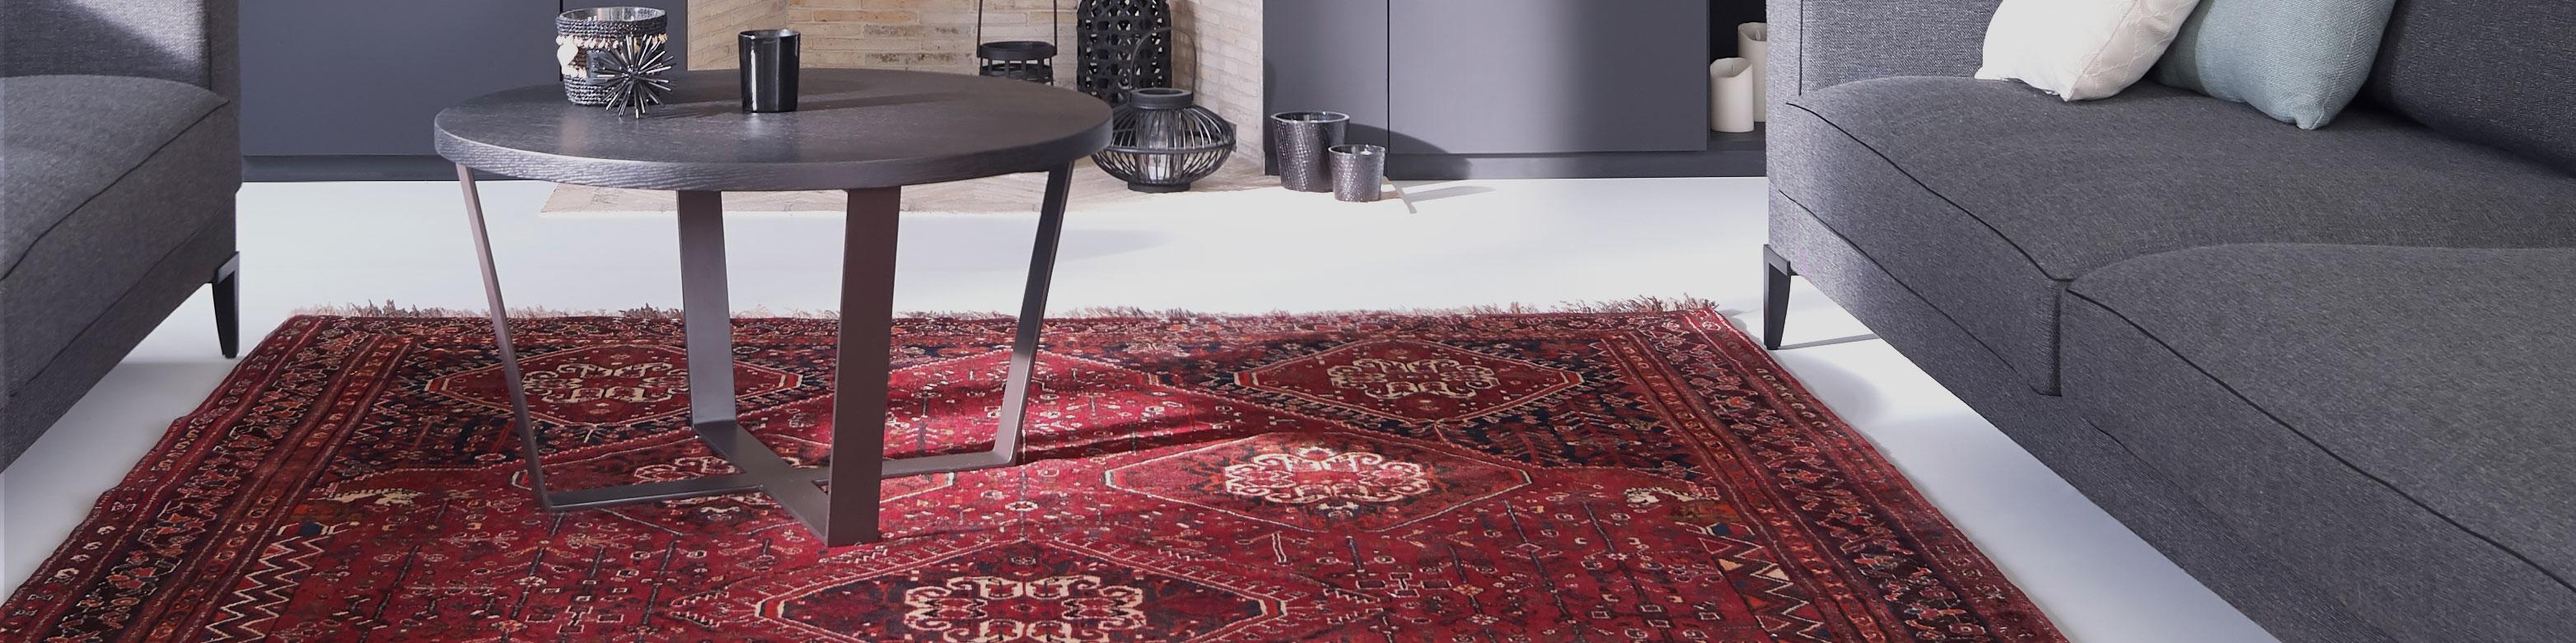 tapis oriental tapis style oriental moderne saint maclou